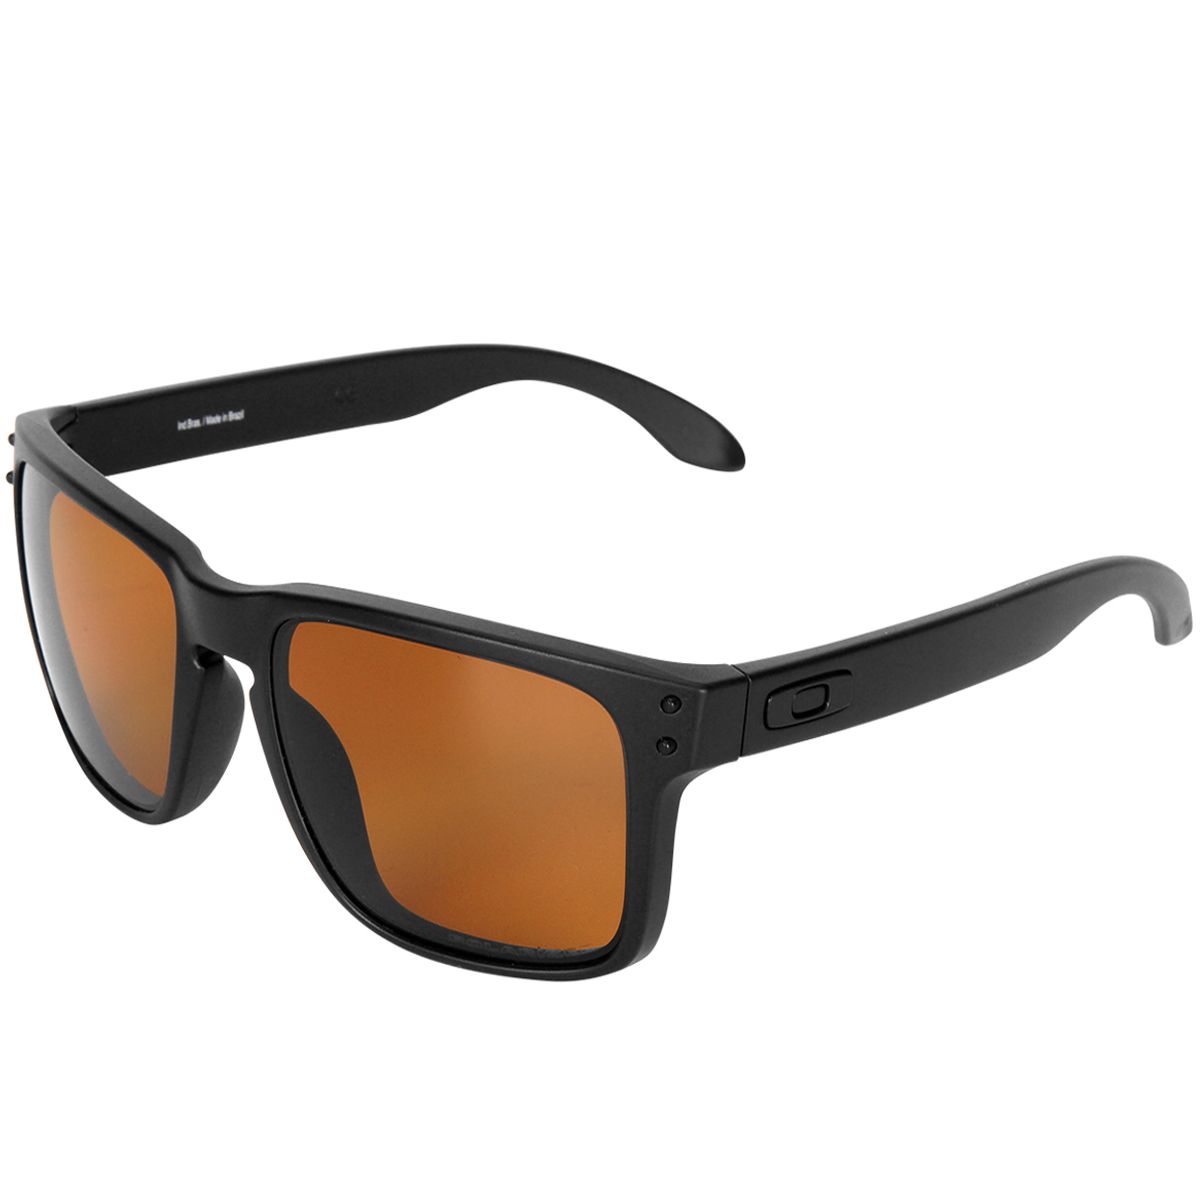 a4217d463fec1 Óculos Oakley Holbrook LX Matte Black Lente Bronze Polarizado ref ...